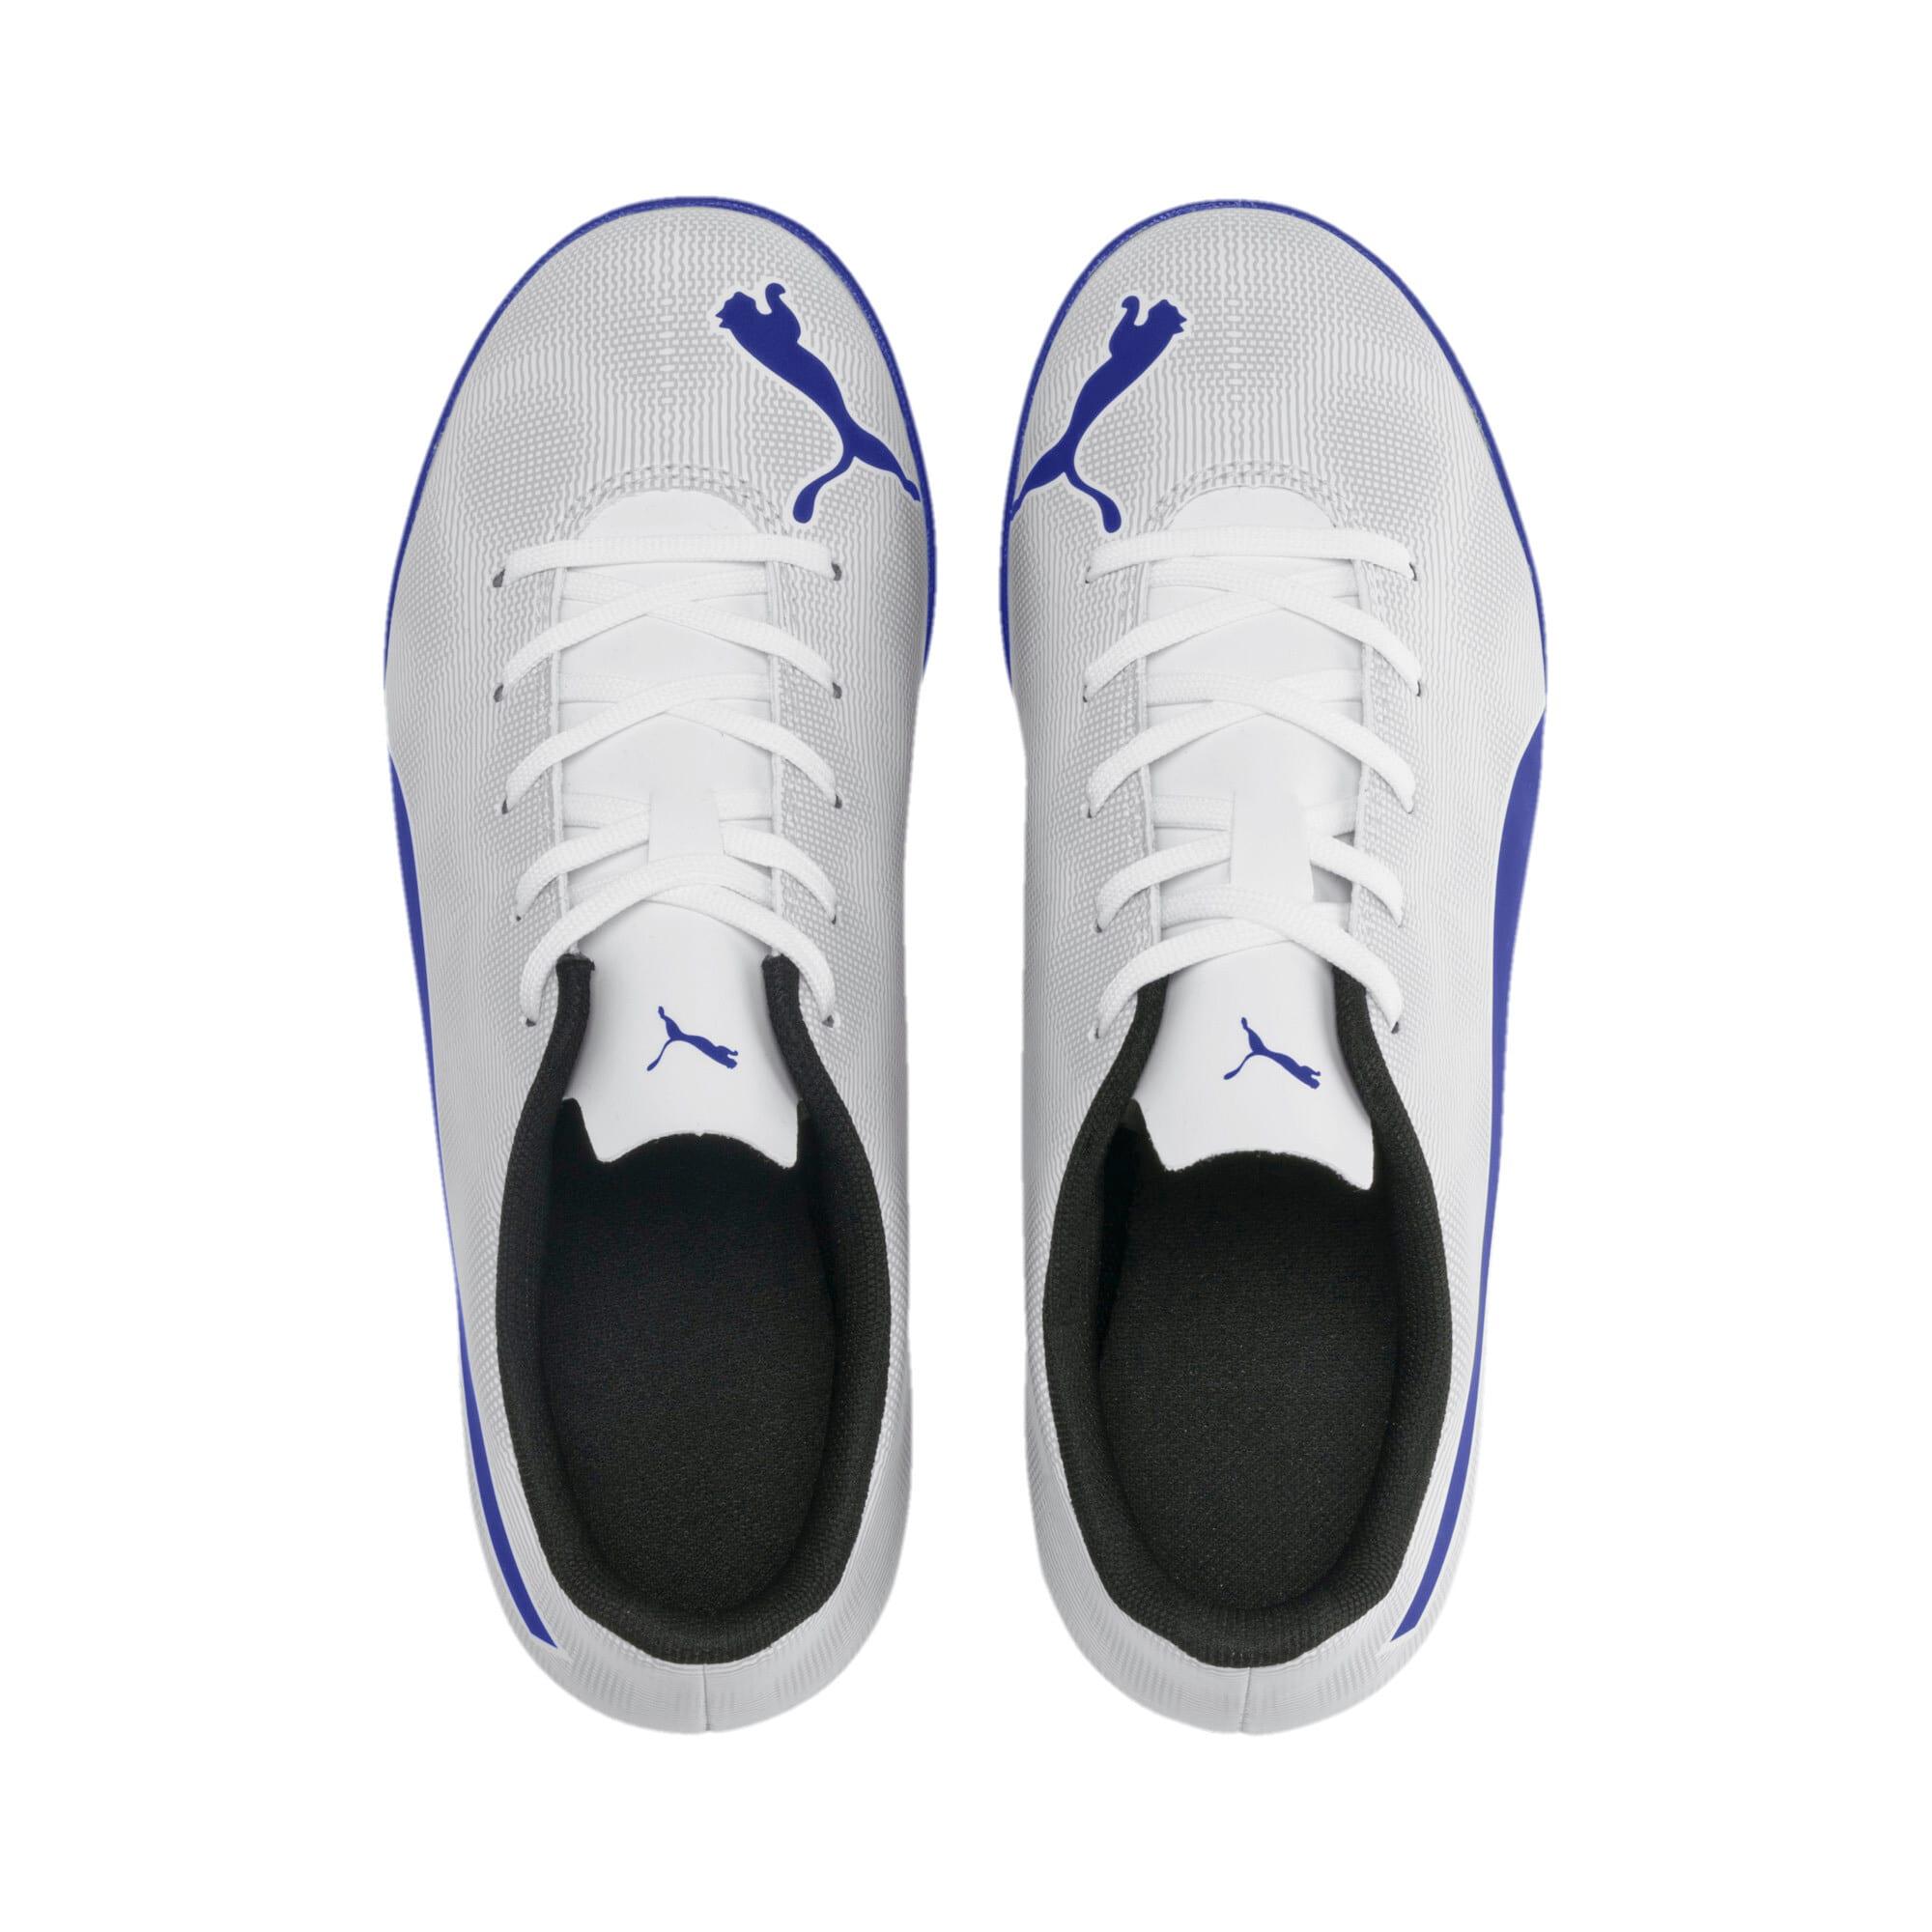 Thumbnail 6 of Rapido IT Boy's Soccer Shoes JR, White-Royal Blue-Light Gray, medium